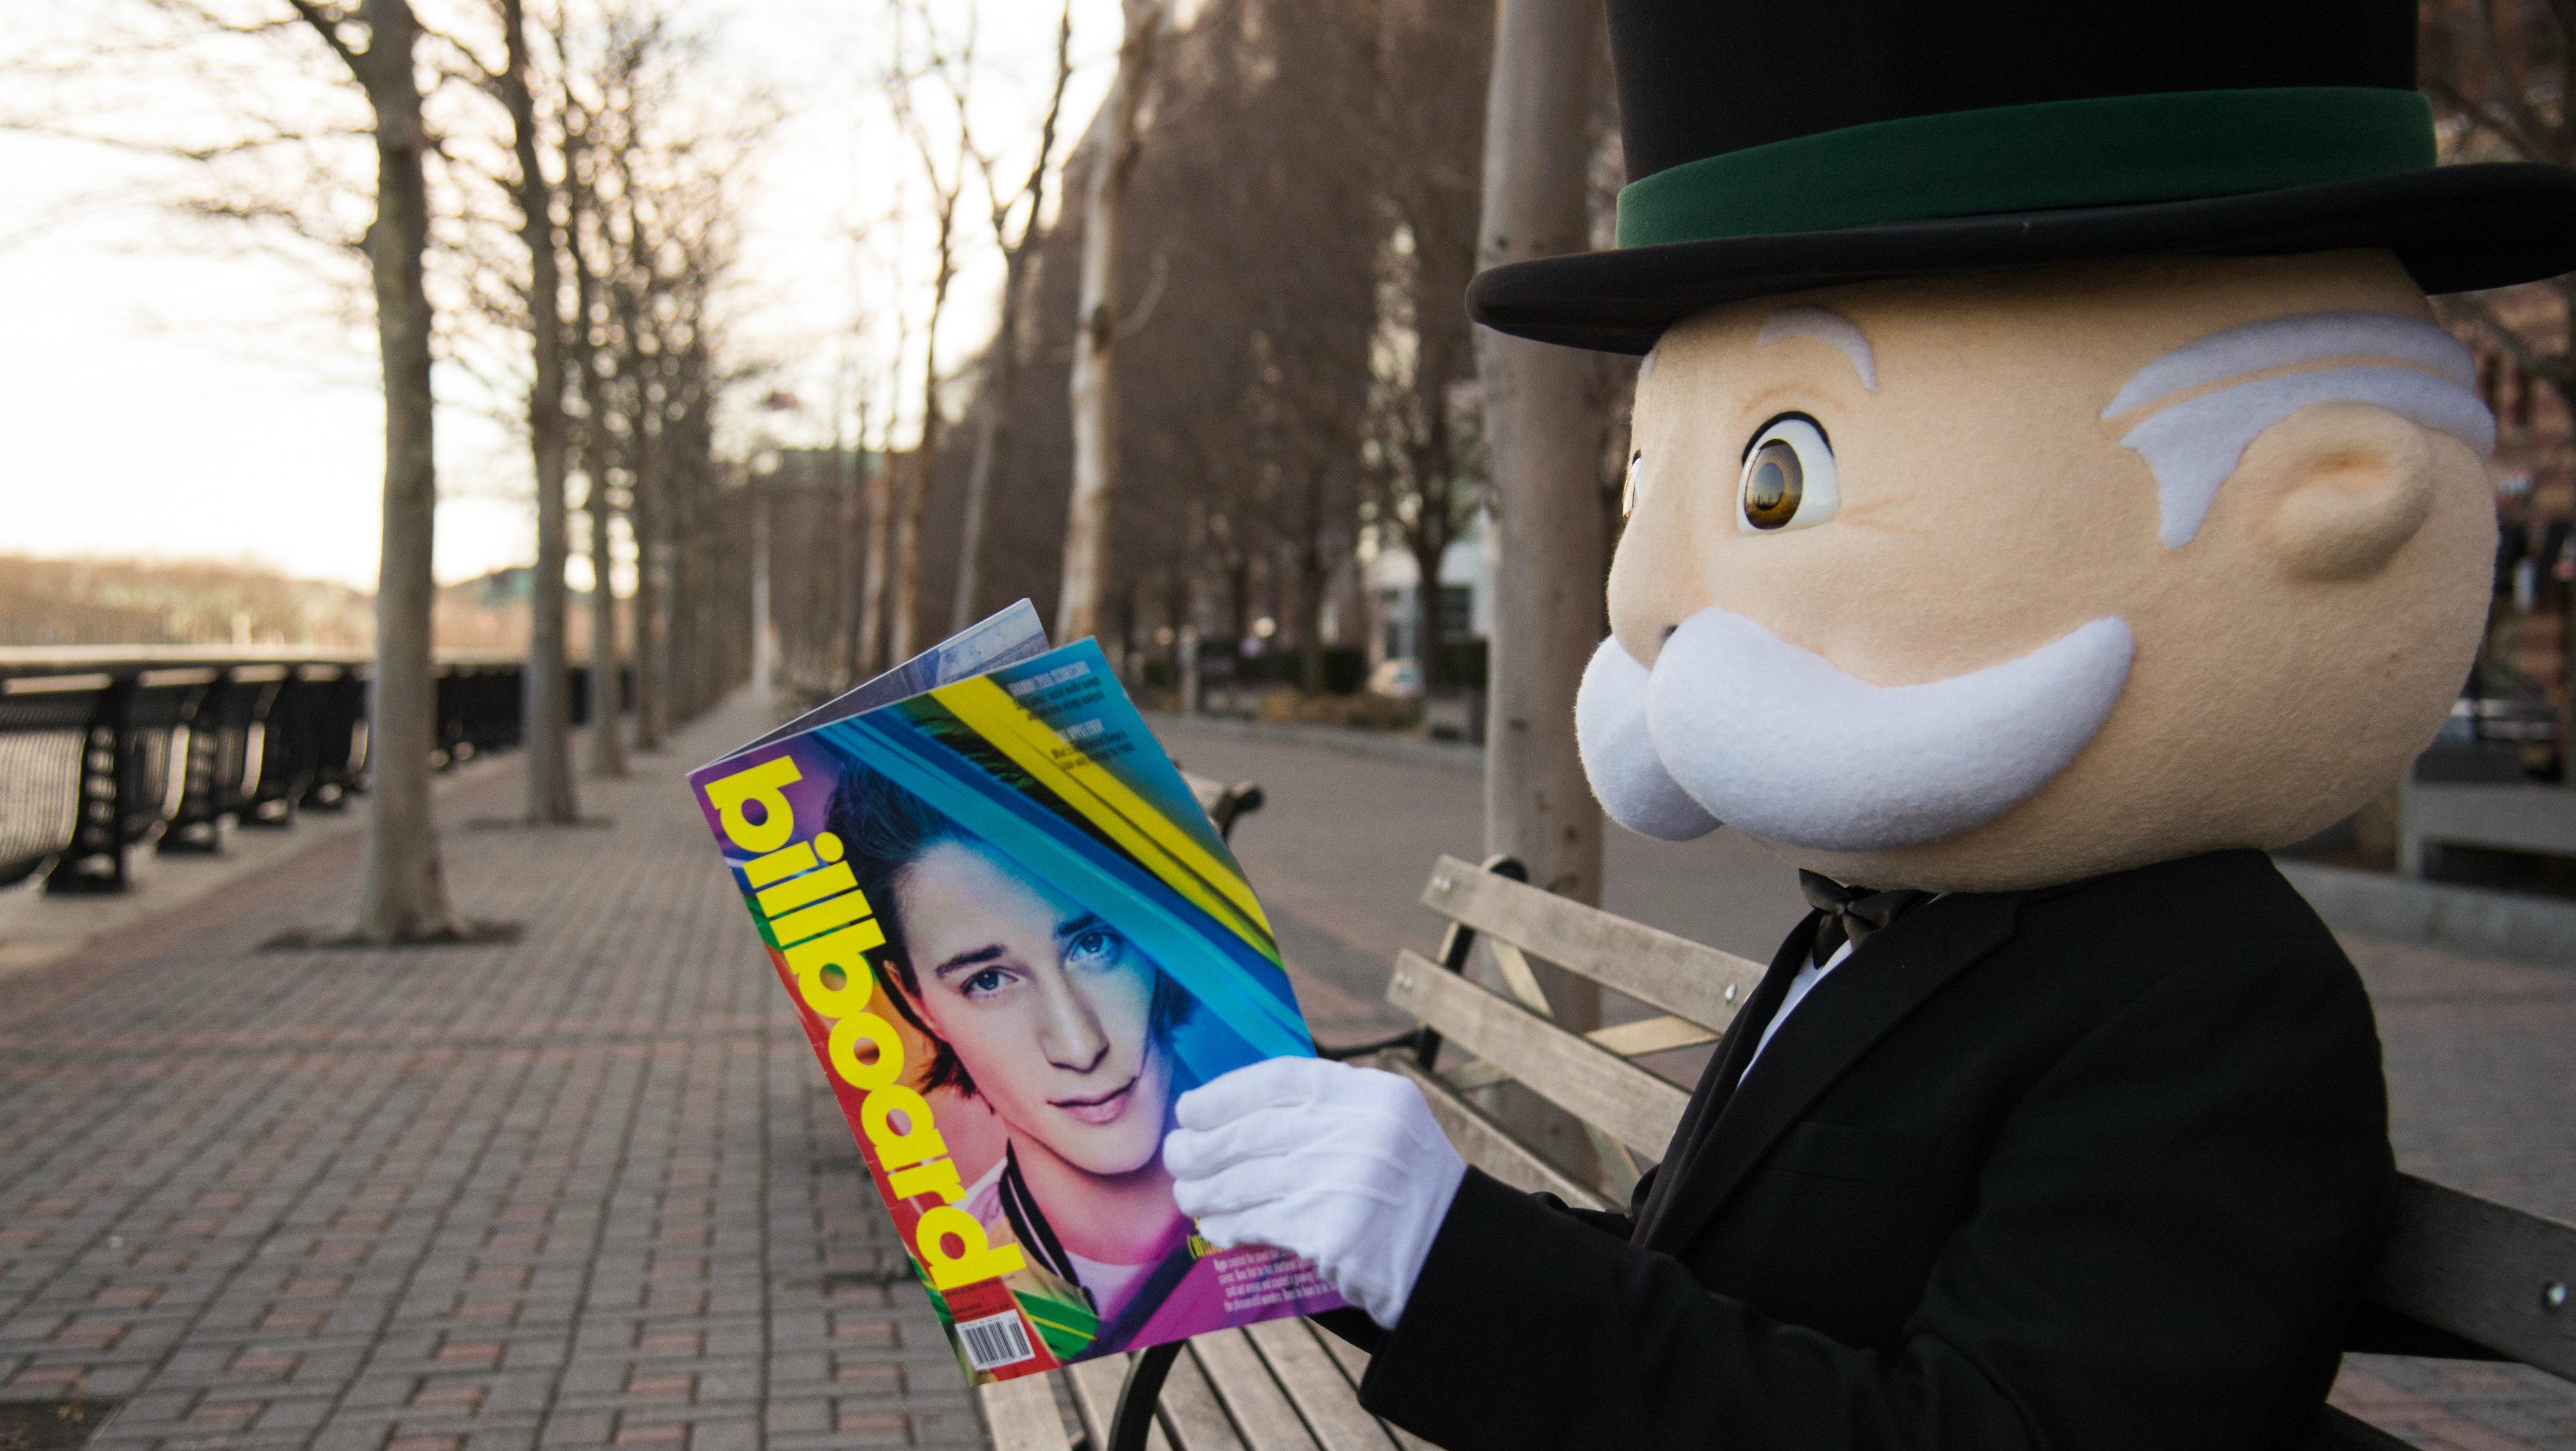 Monopoly man reading Billboard magazine